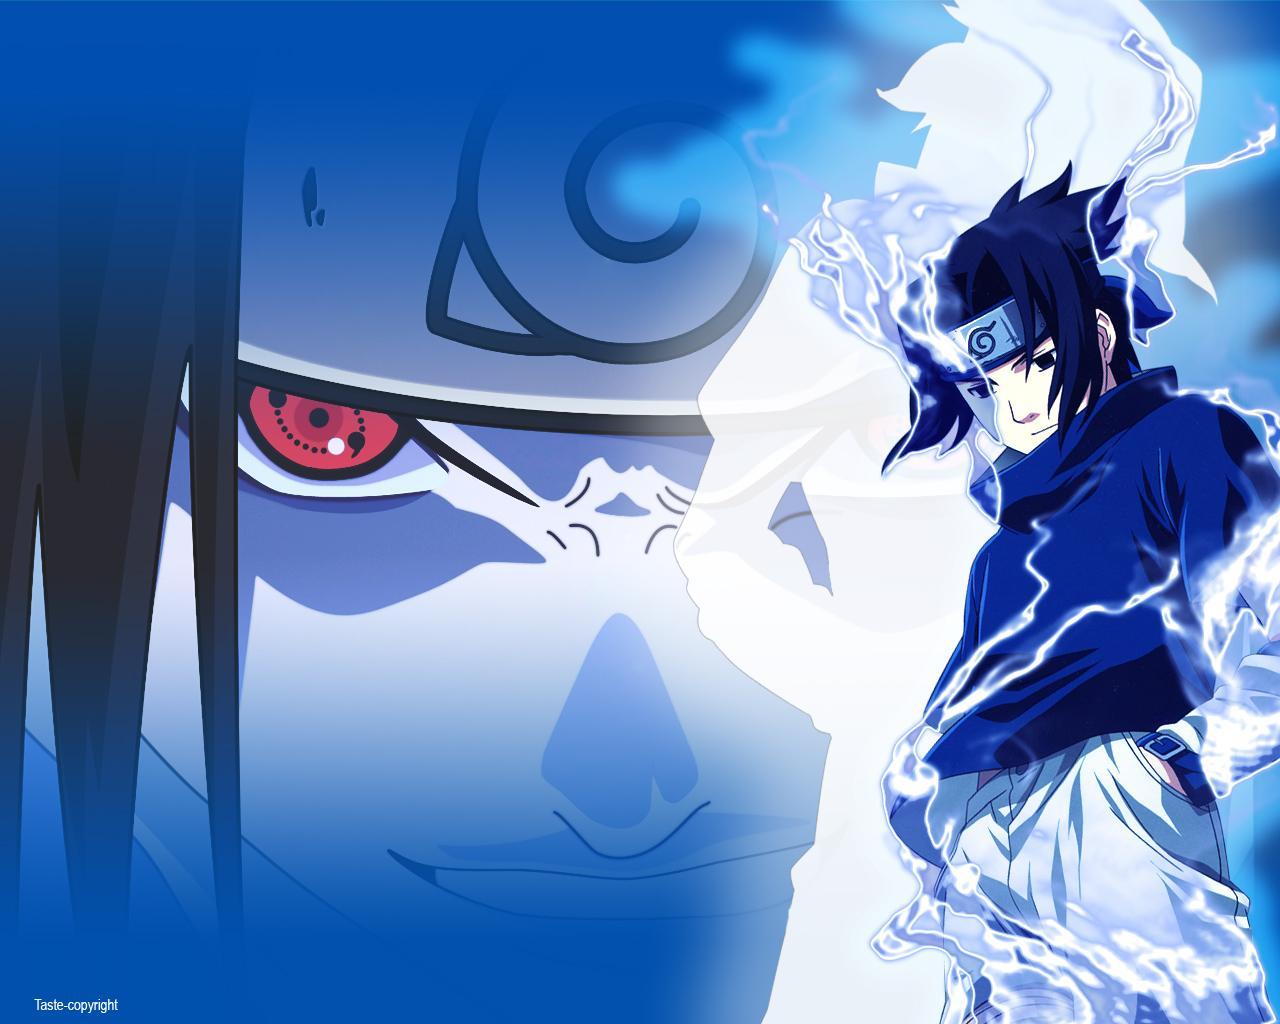 Naruto images Sasuke Wallpaper HD wallpaper and background ...